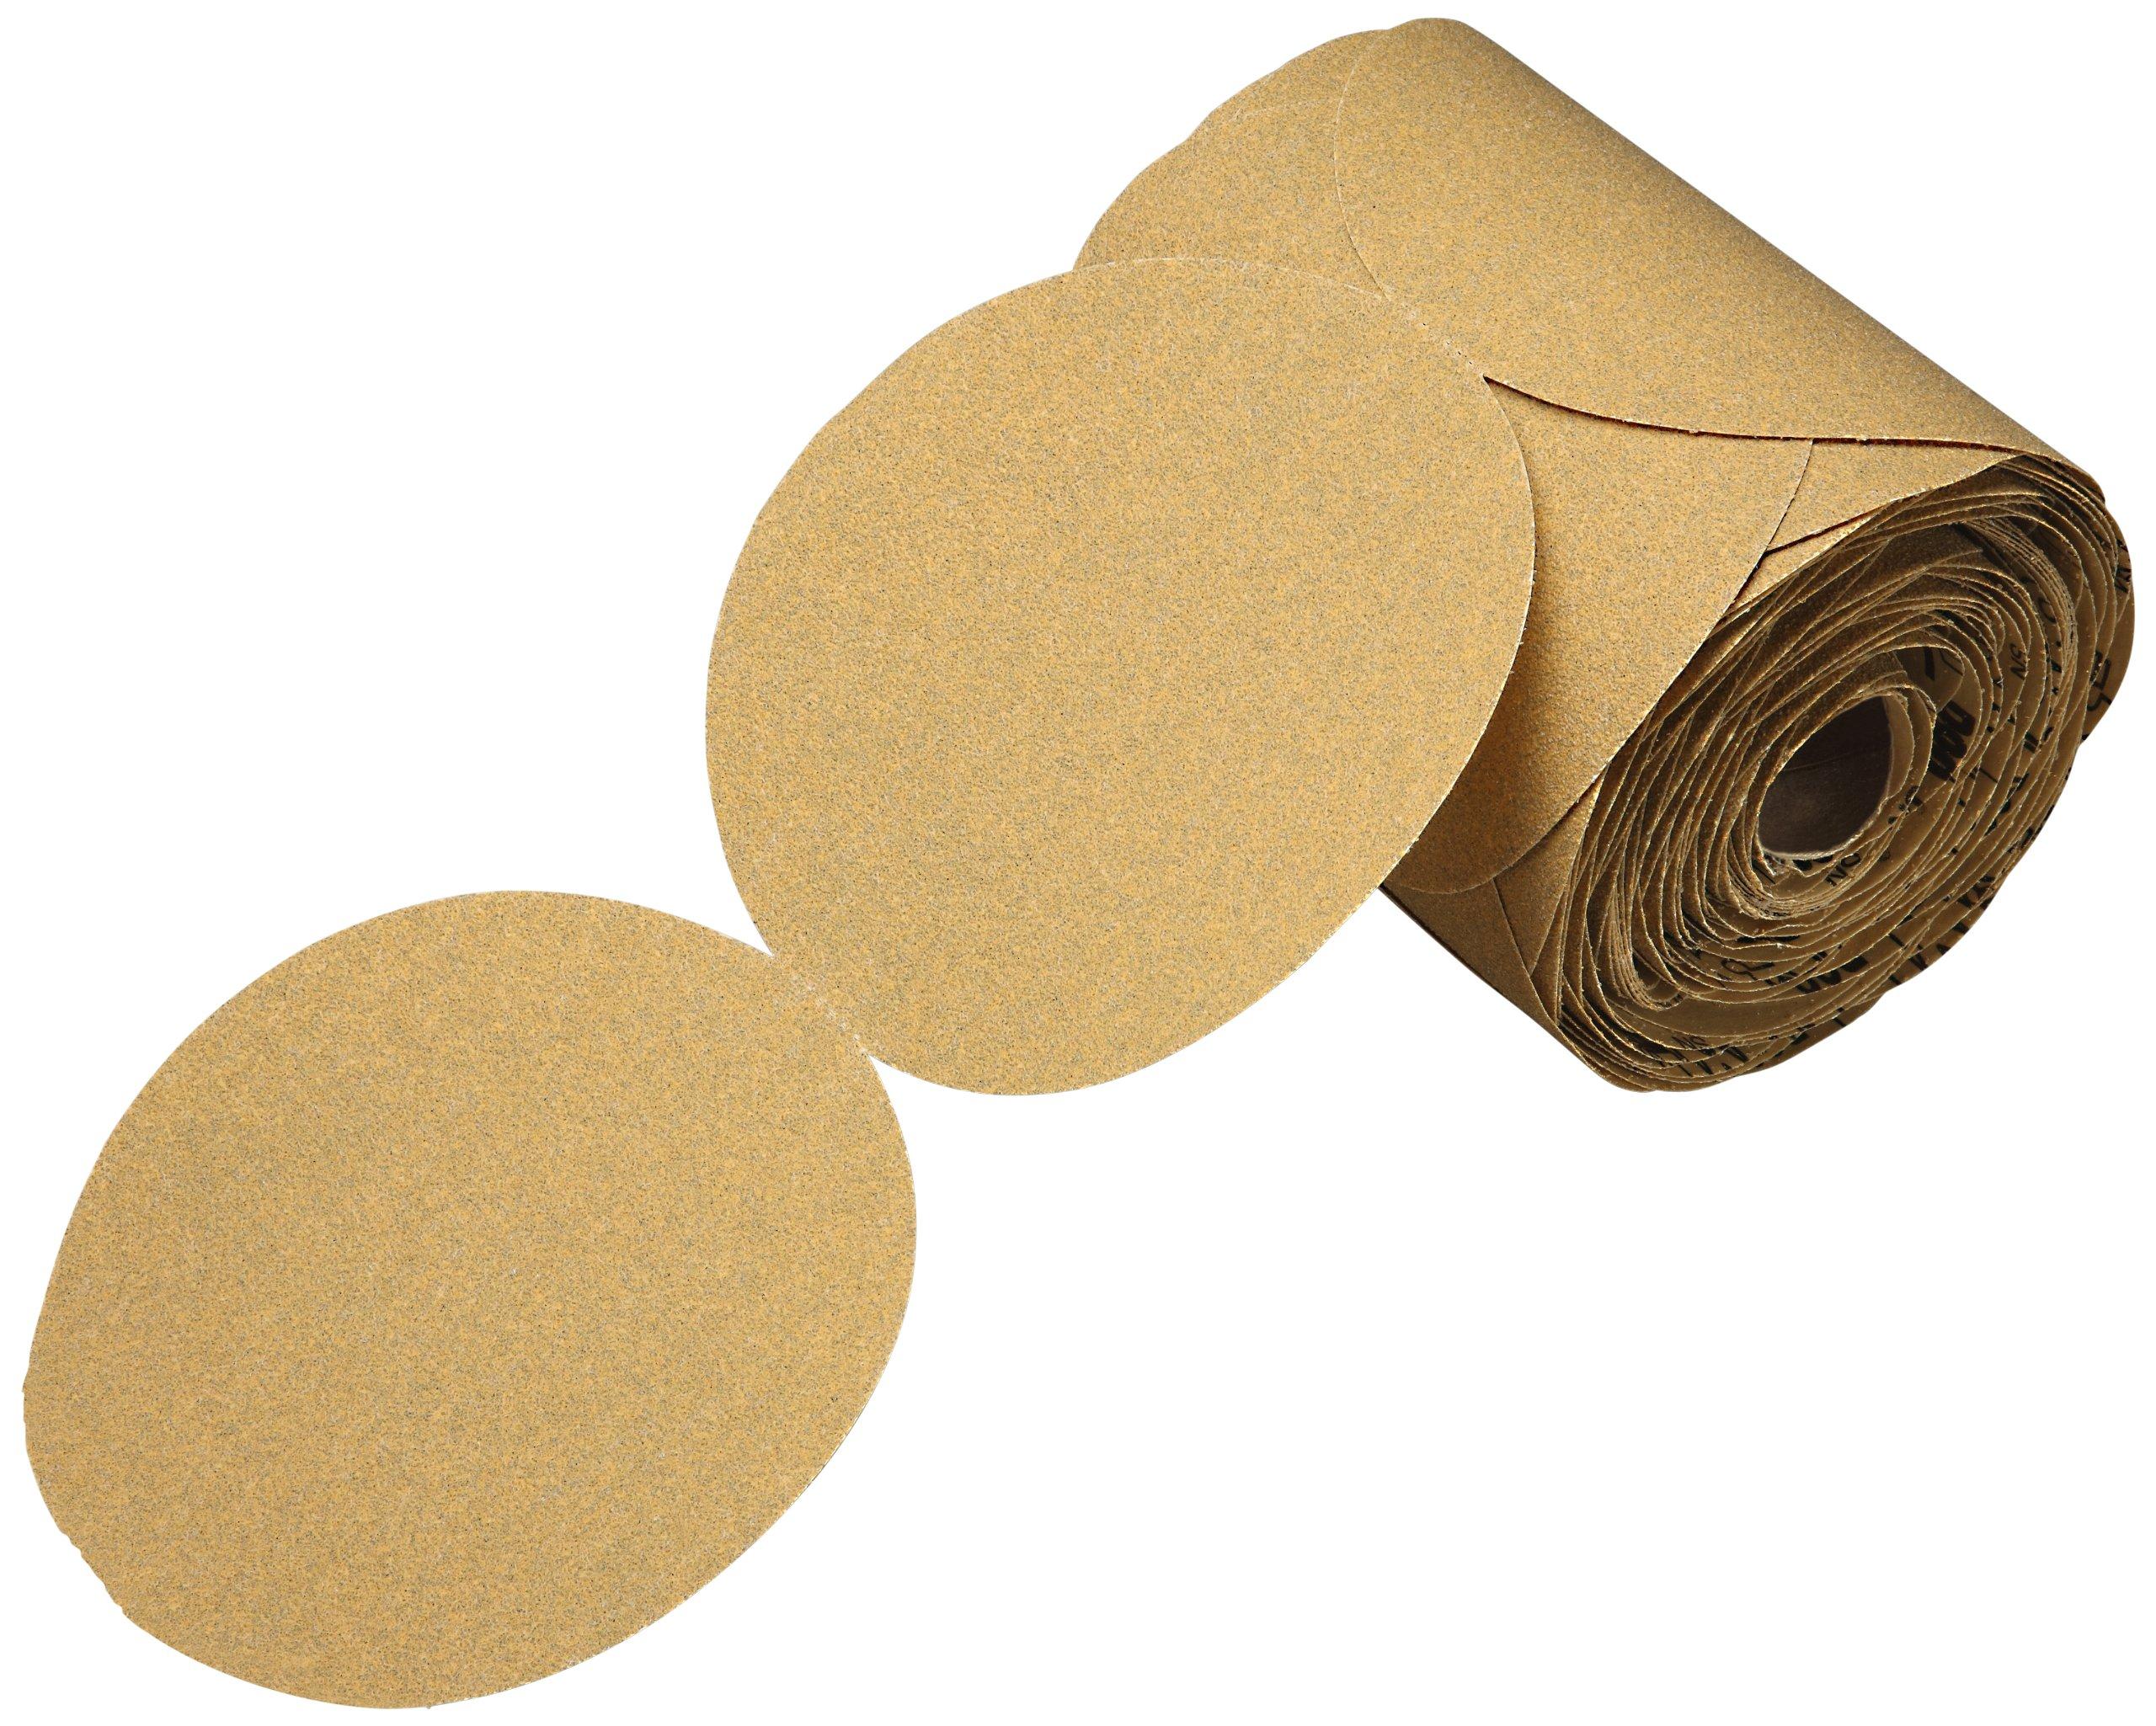 3M Stikit Gold Paper Disc Roll 216U, Aluminum Oxide, 5'' Diameter, P400 Grit, Gold (Roll of 175)